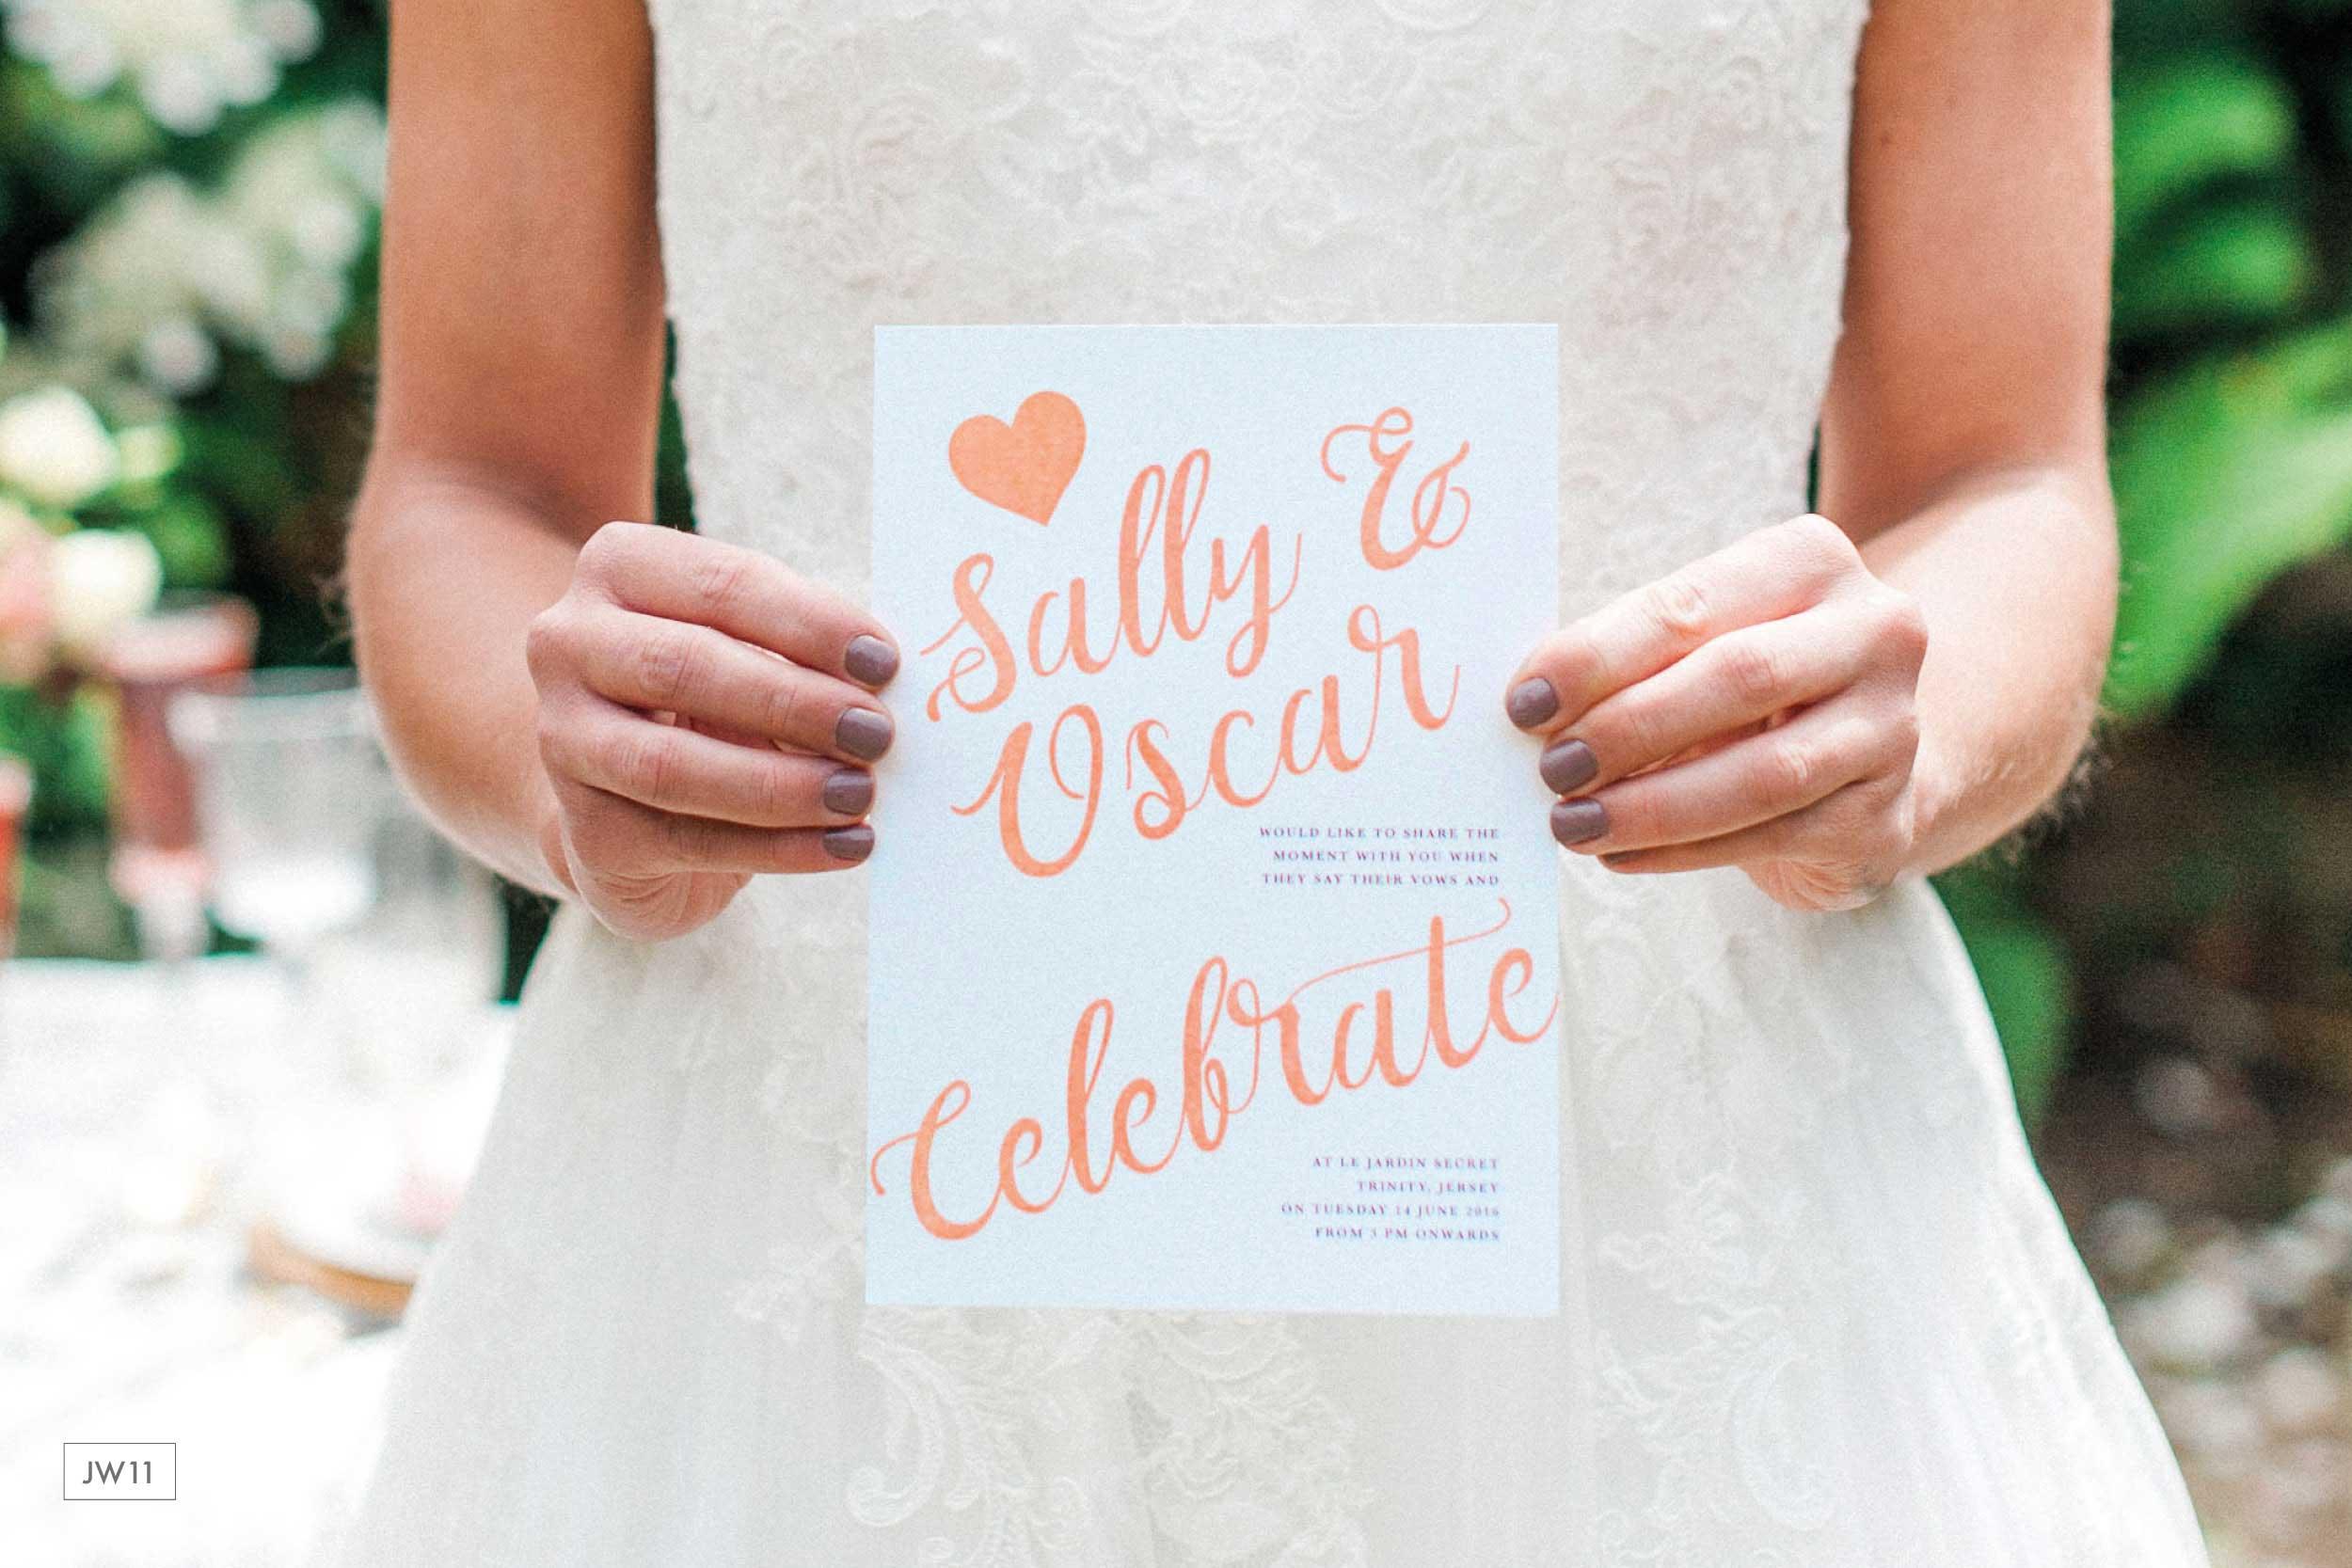 Peach-quotation_wedding-invitation_Jersey-weddings_ananyacards.com_Kate-Nielen-Photography.jpg